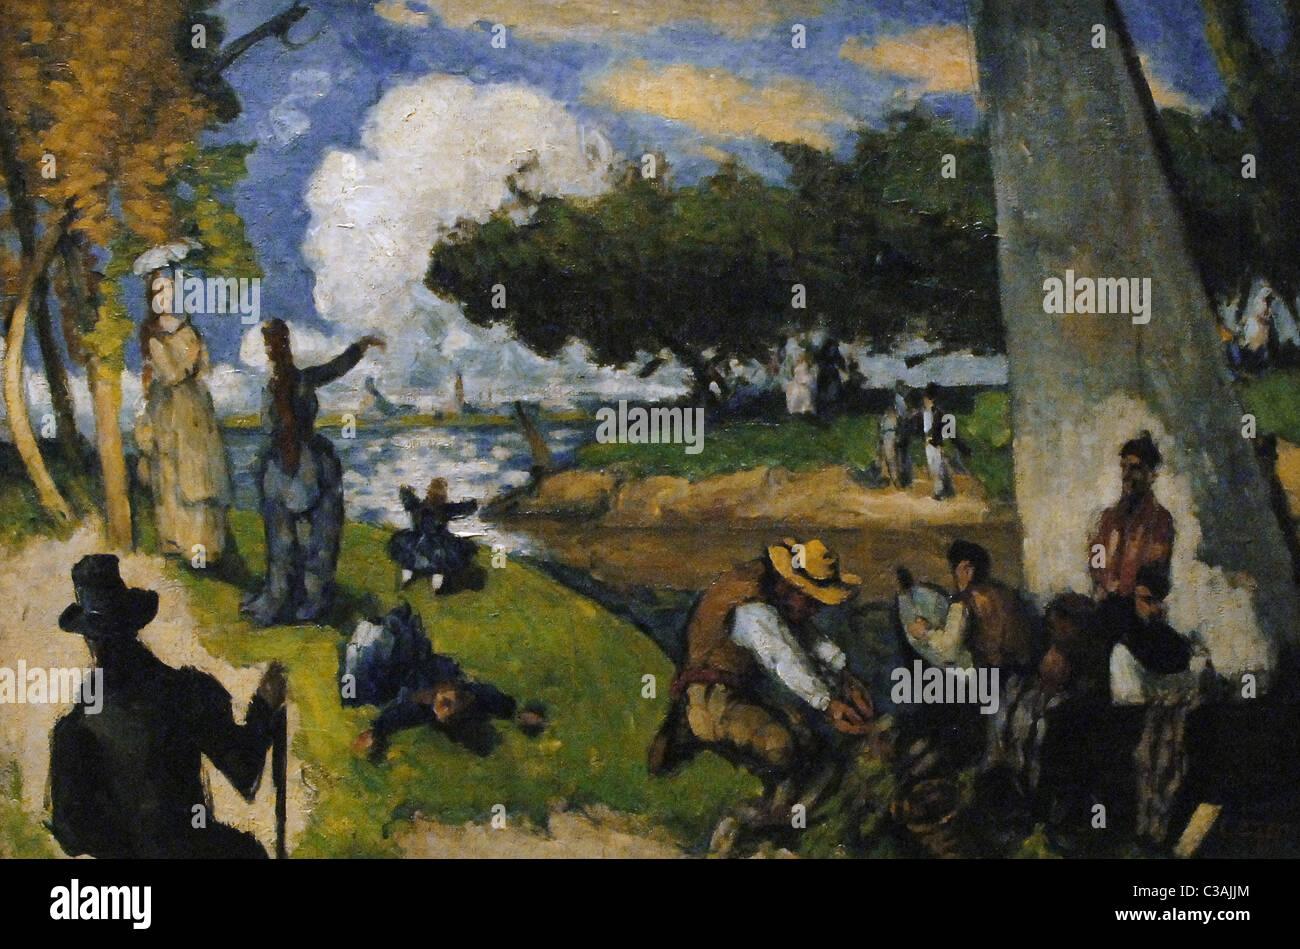 Paul Cezanne (1839-1906). French Post-Impressionist painter. The Fishermen (Fantastic Scene). Ca. 1875. Oil on canvas. - Stock Image